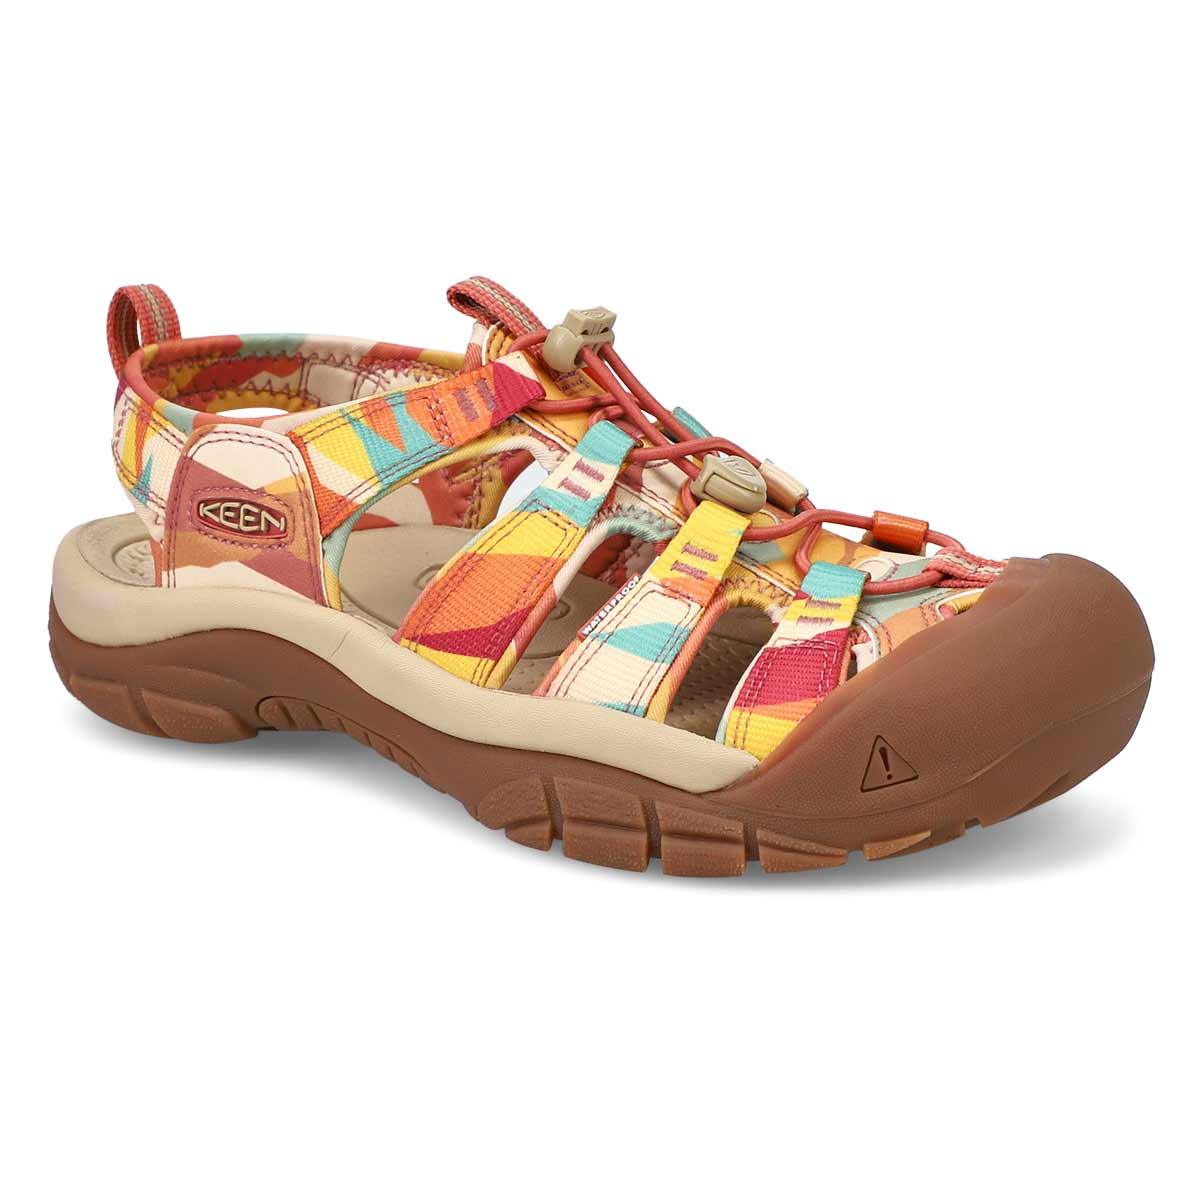 Sandale sport NEWPORT H2, rouge/multi,femmes